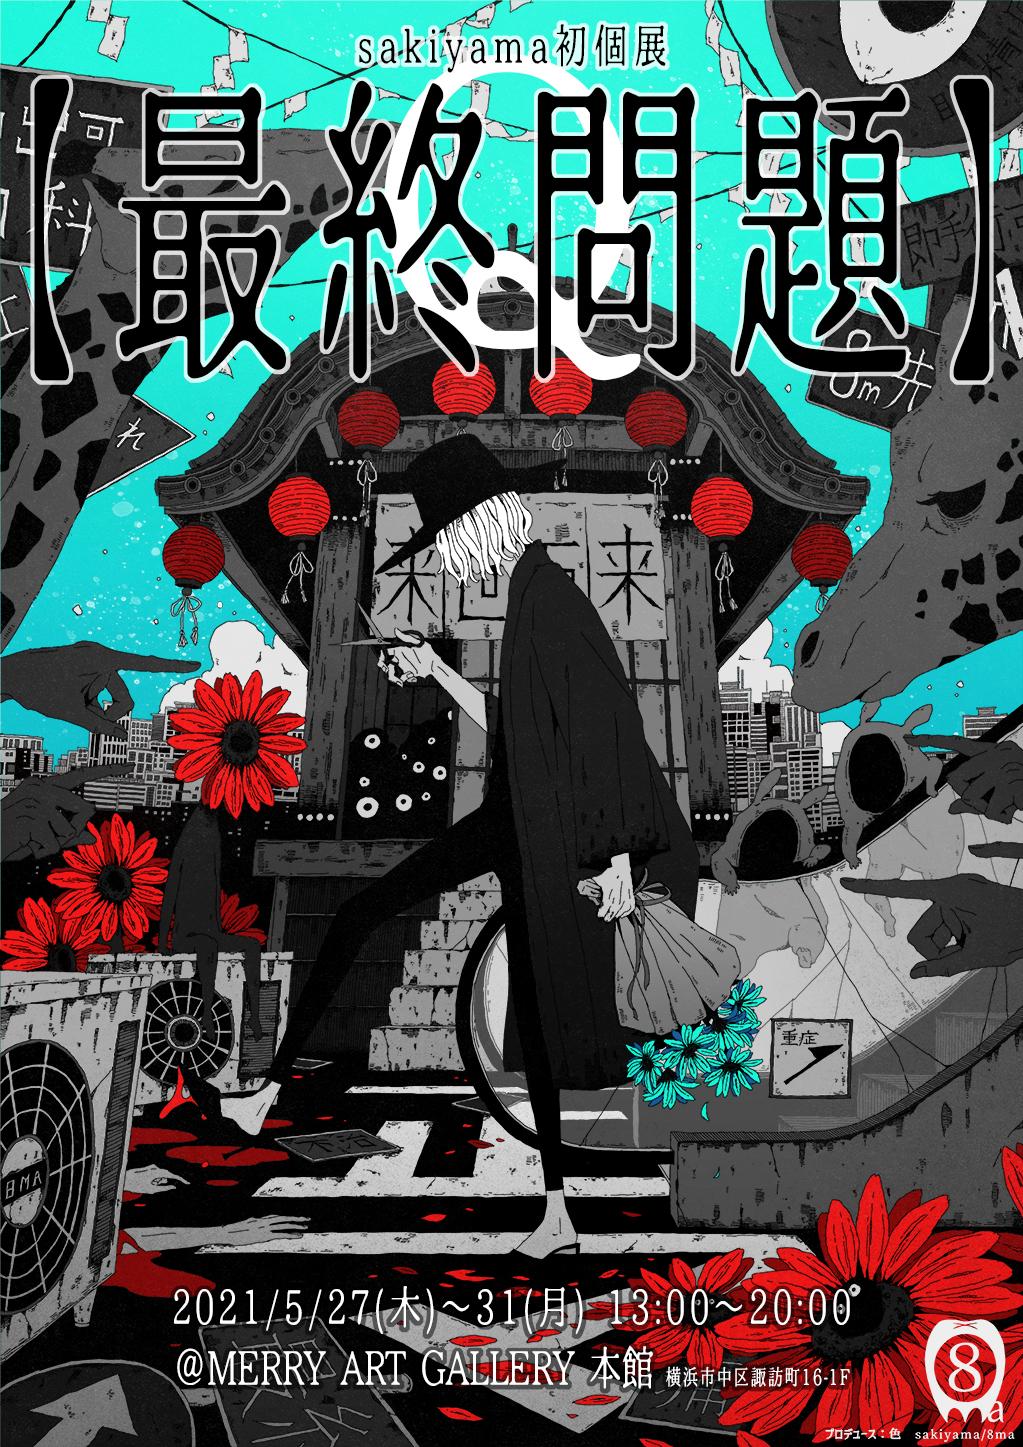 sakiyama 初個展 【最終問題】